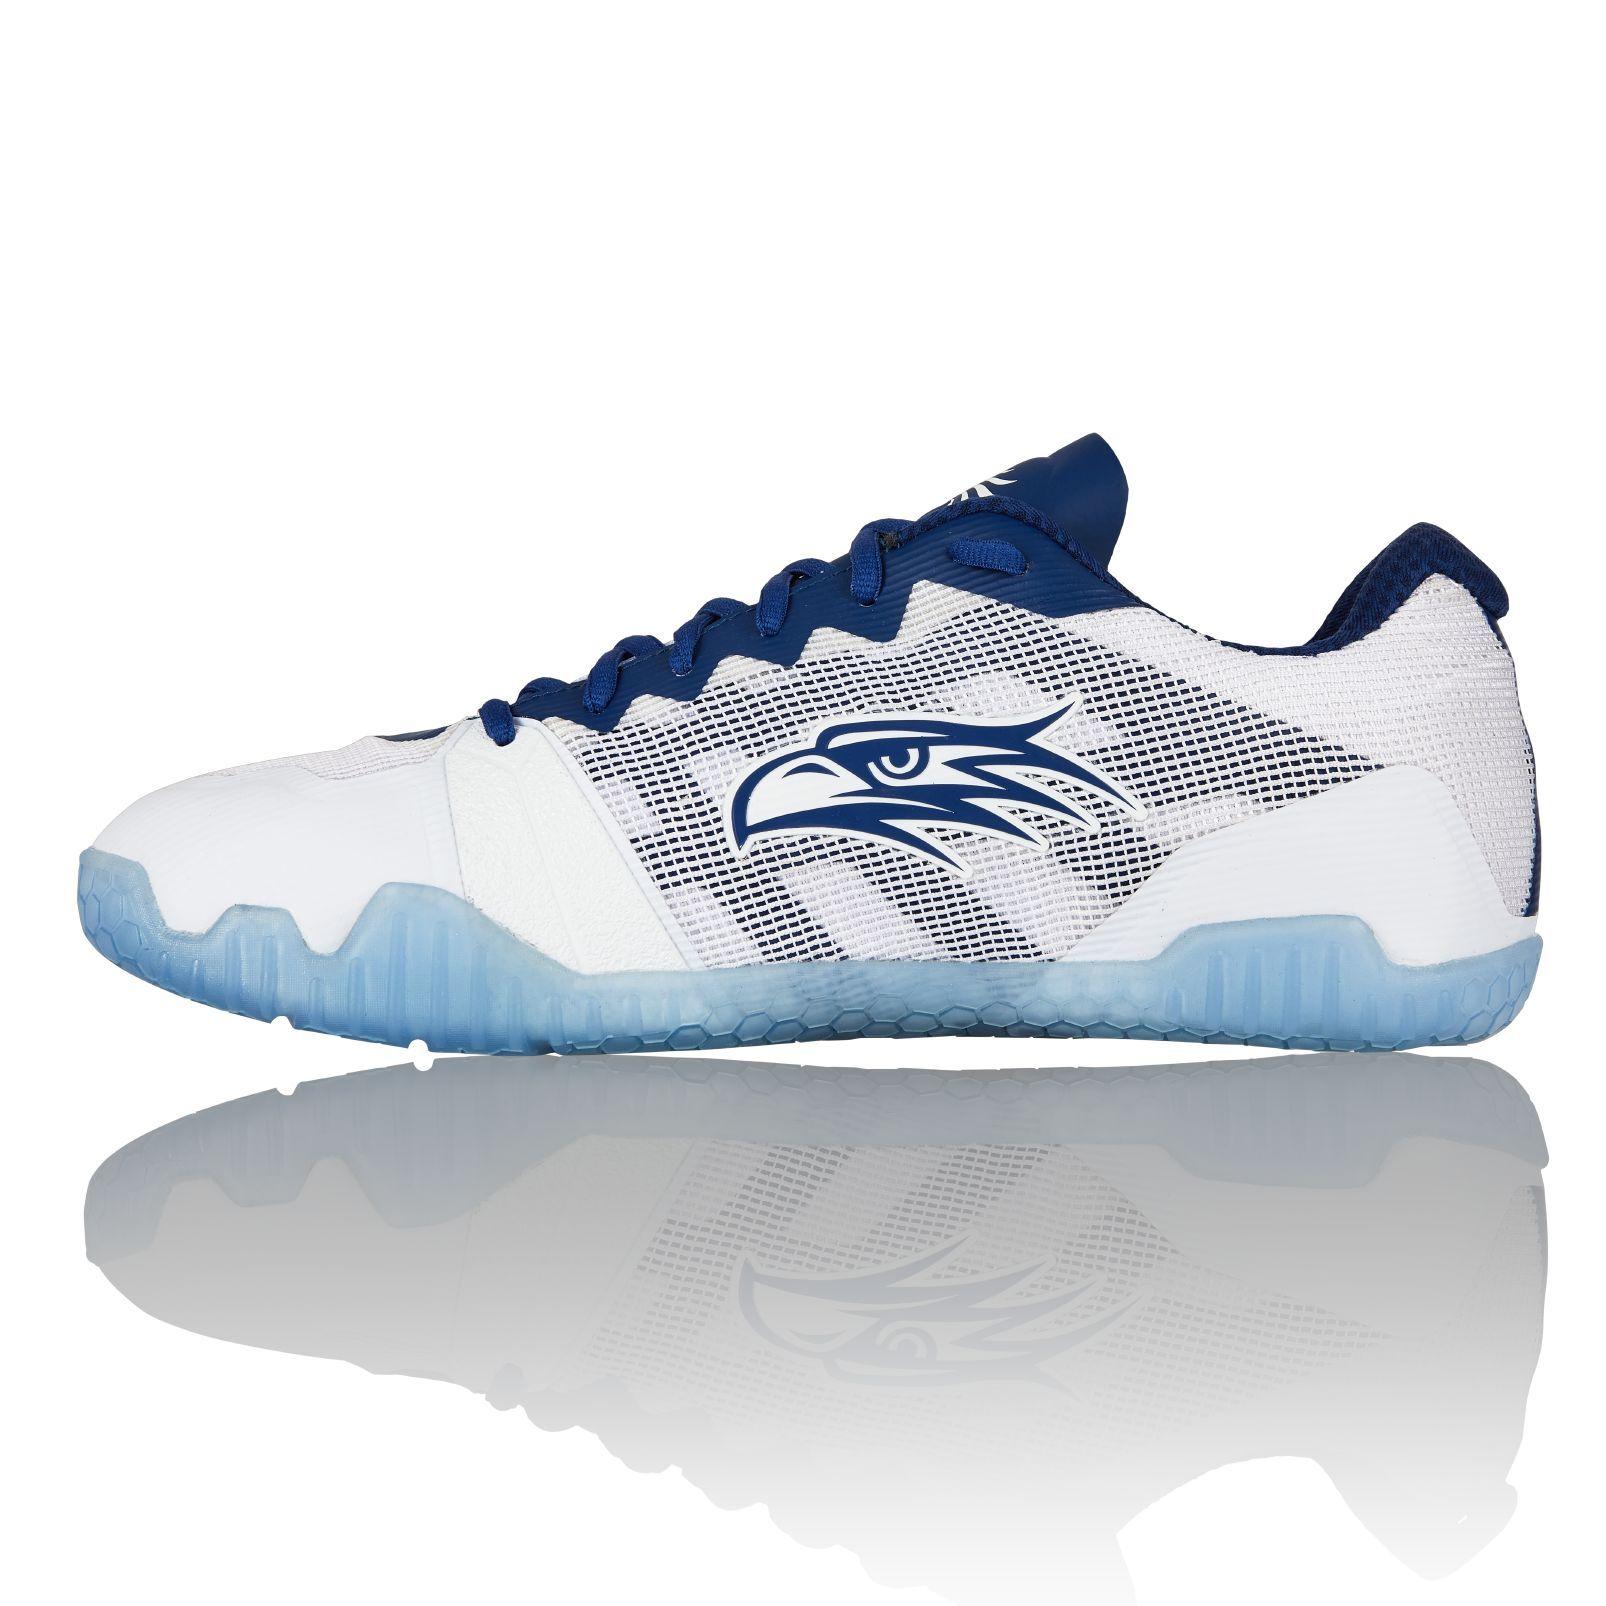 WomenSneakers Hawk White Nike Salming sBhrCdtQx